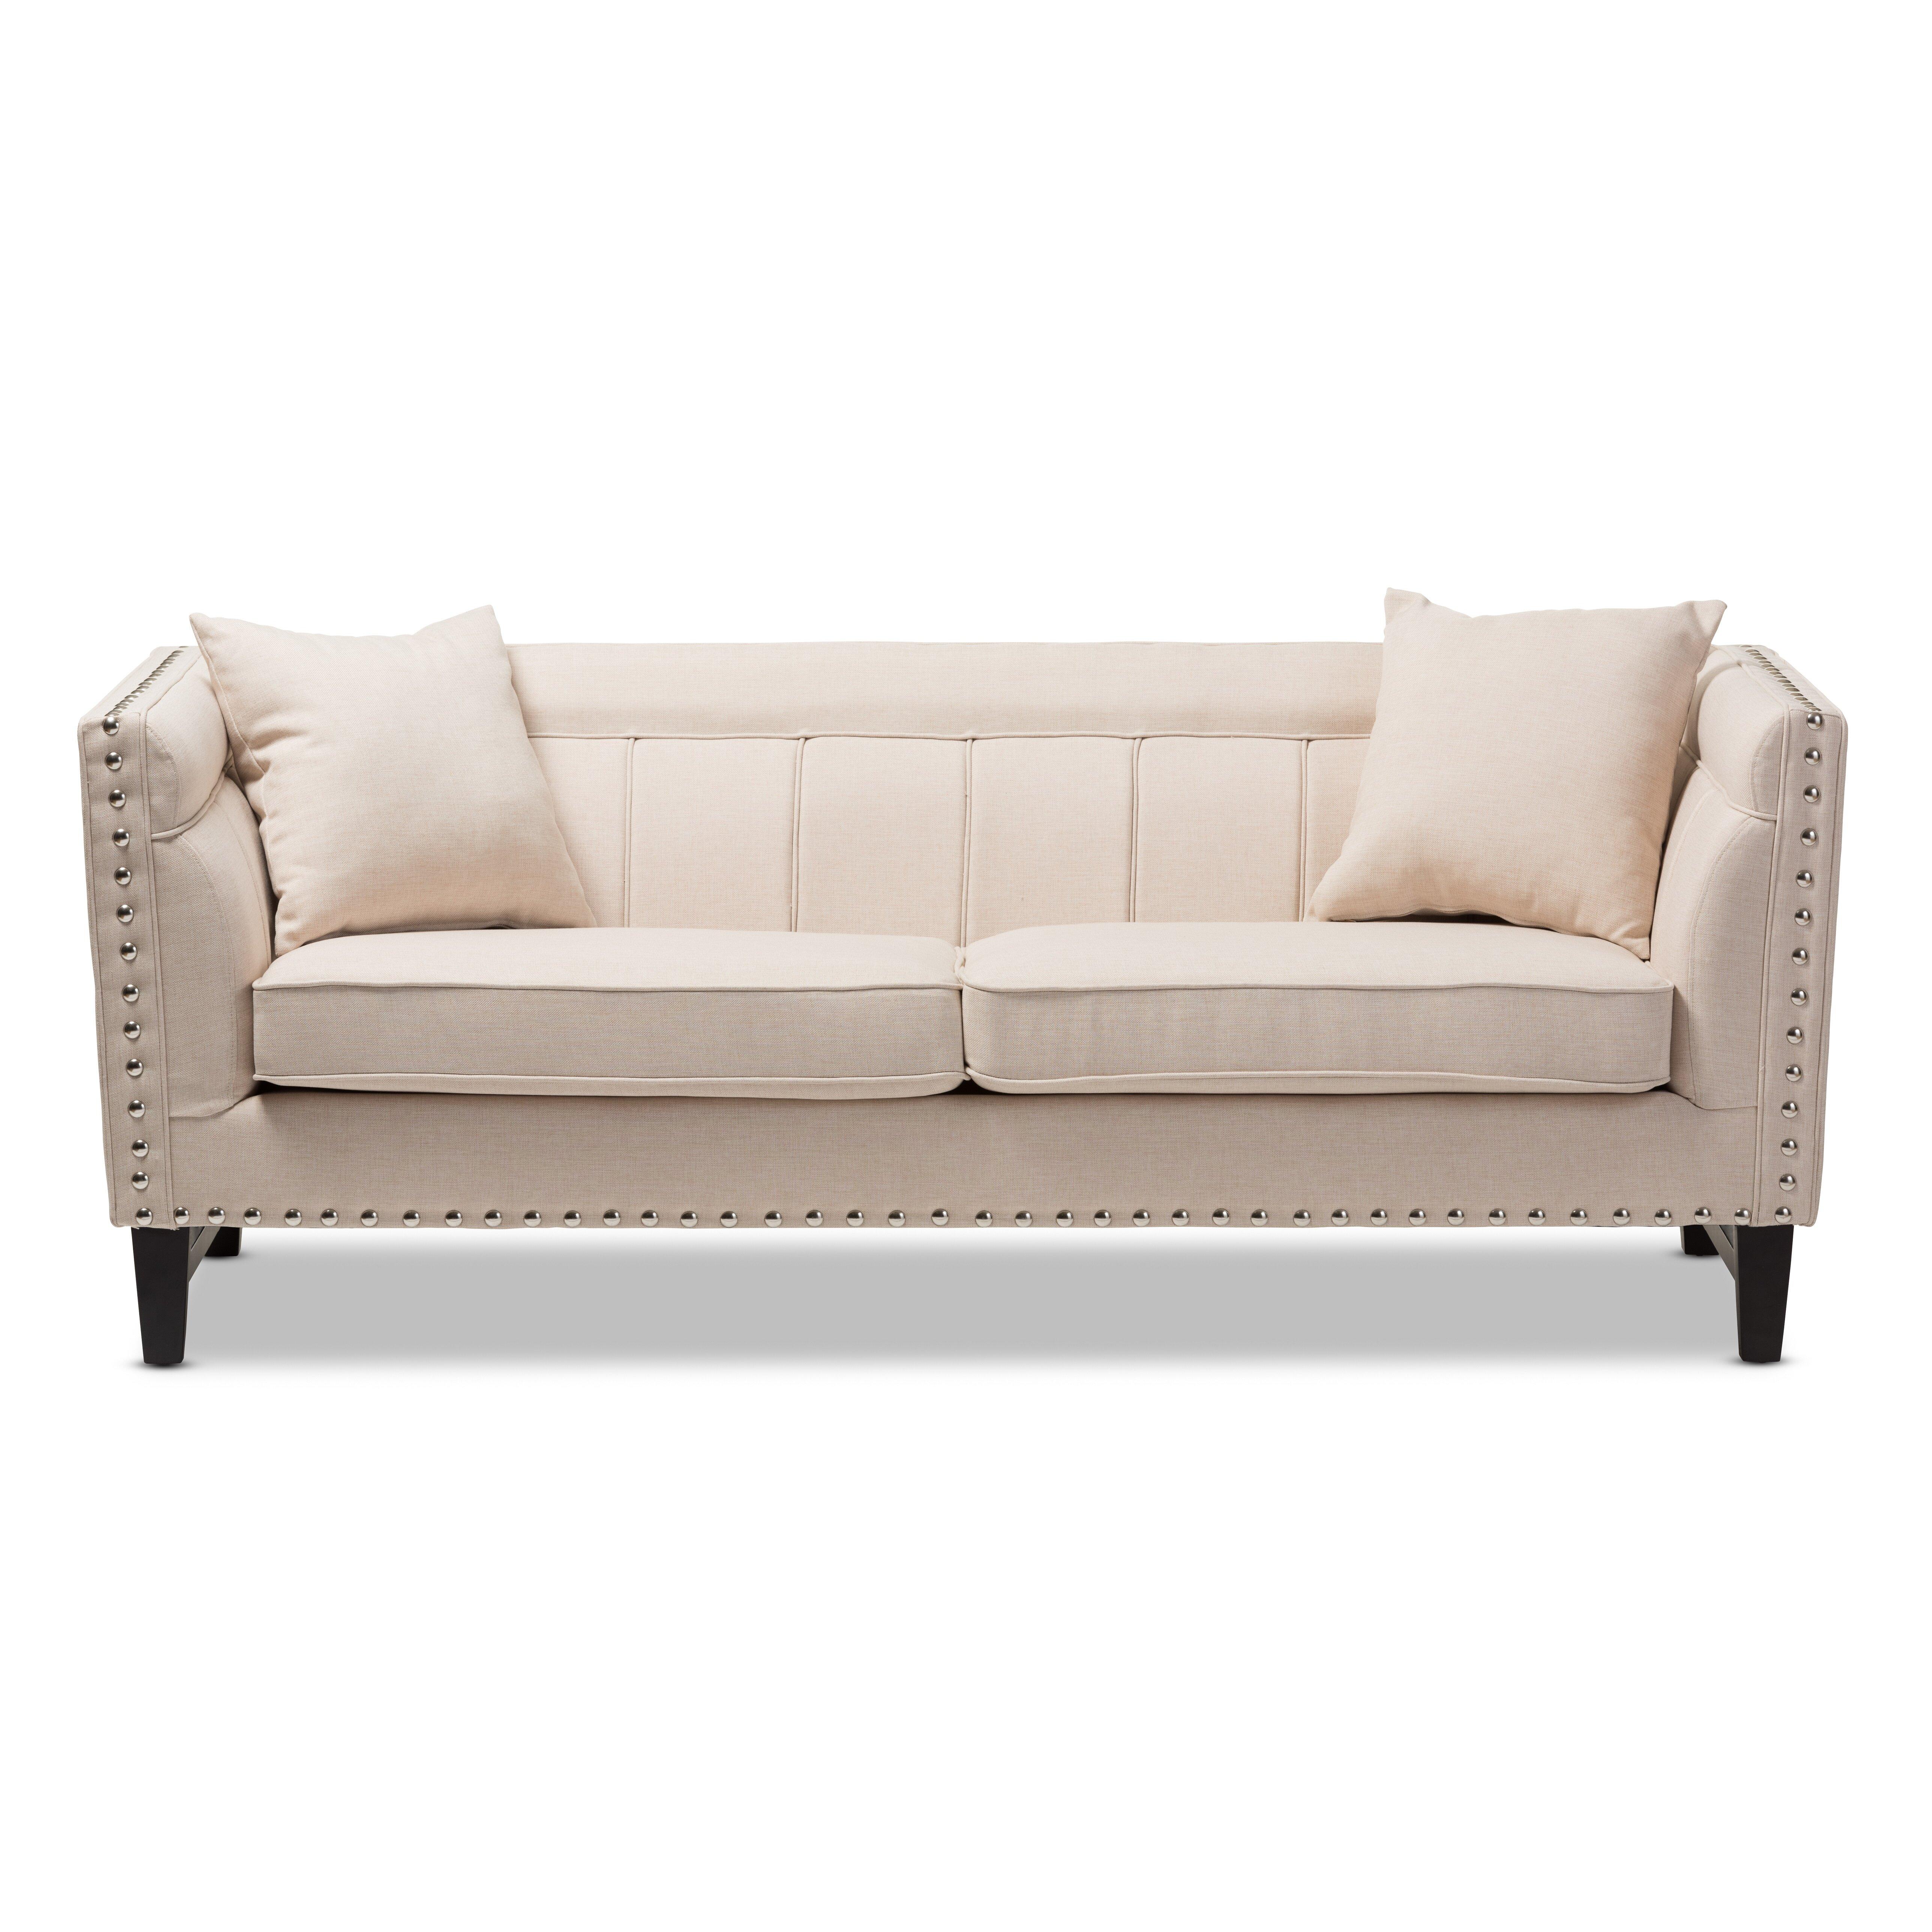 Wholesale Interiors Baxton Studio Stapleton Modern Sofa Reviews Wayfair